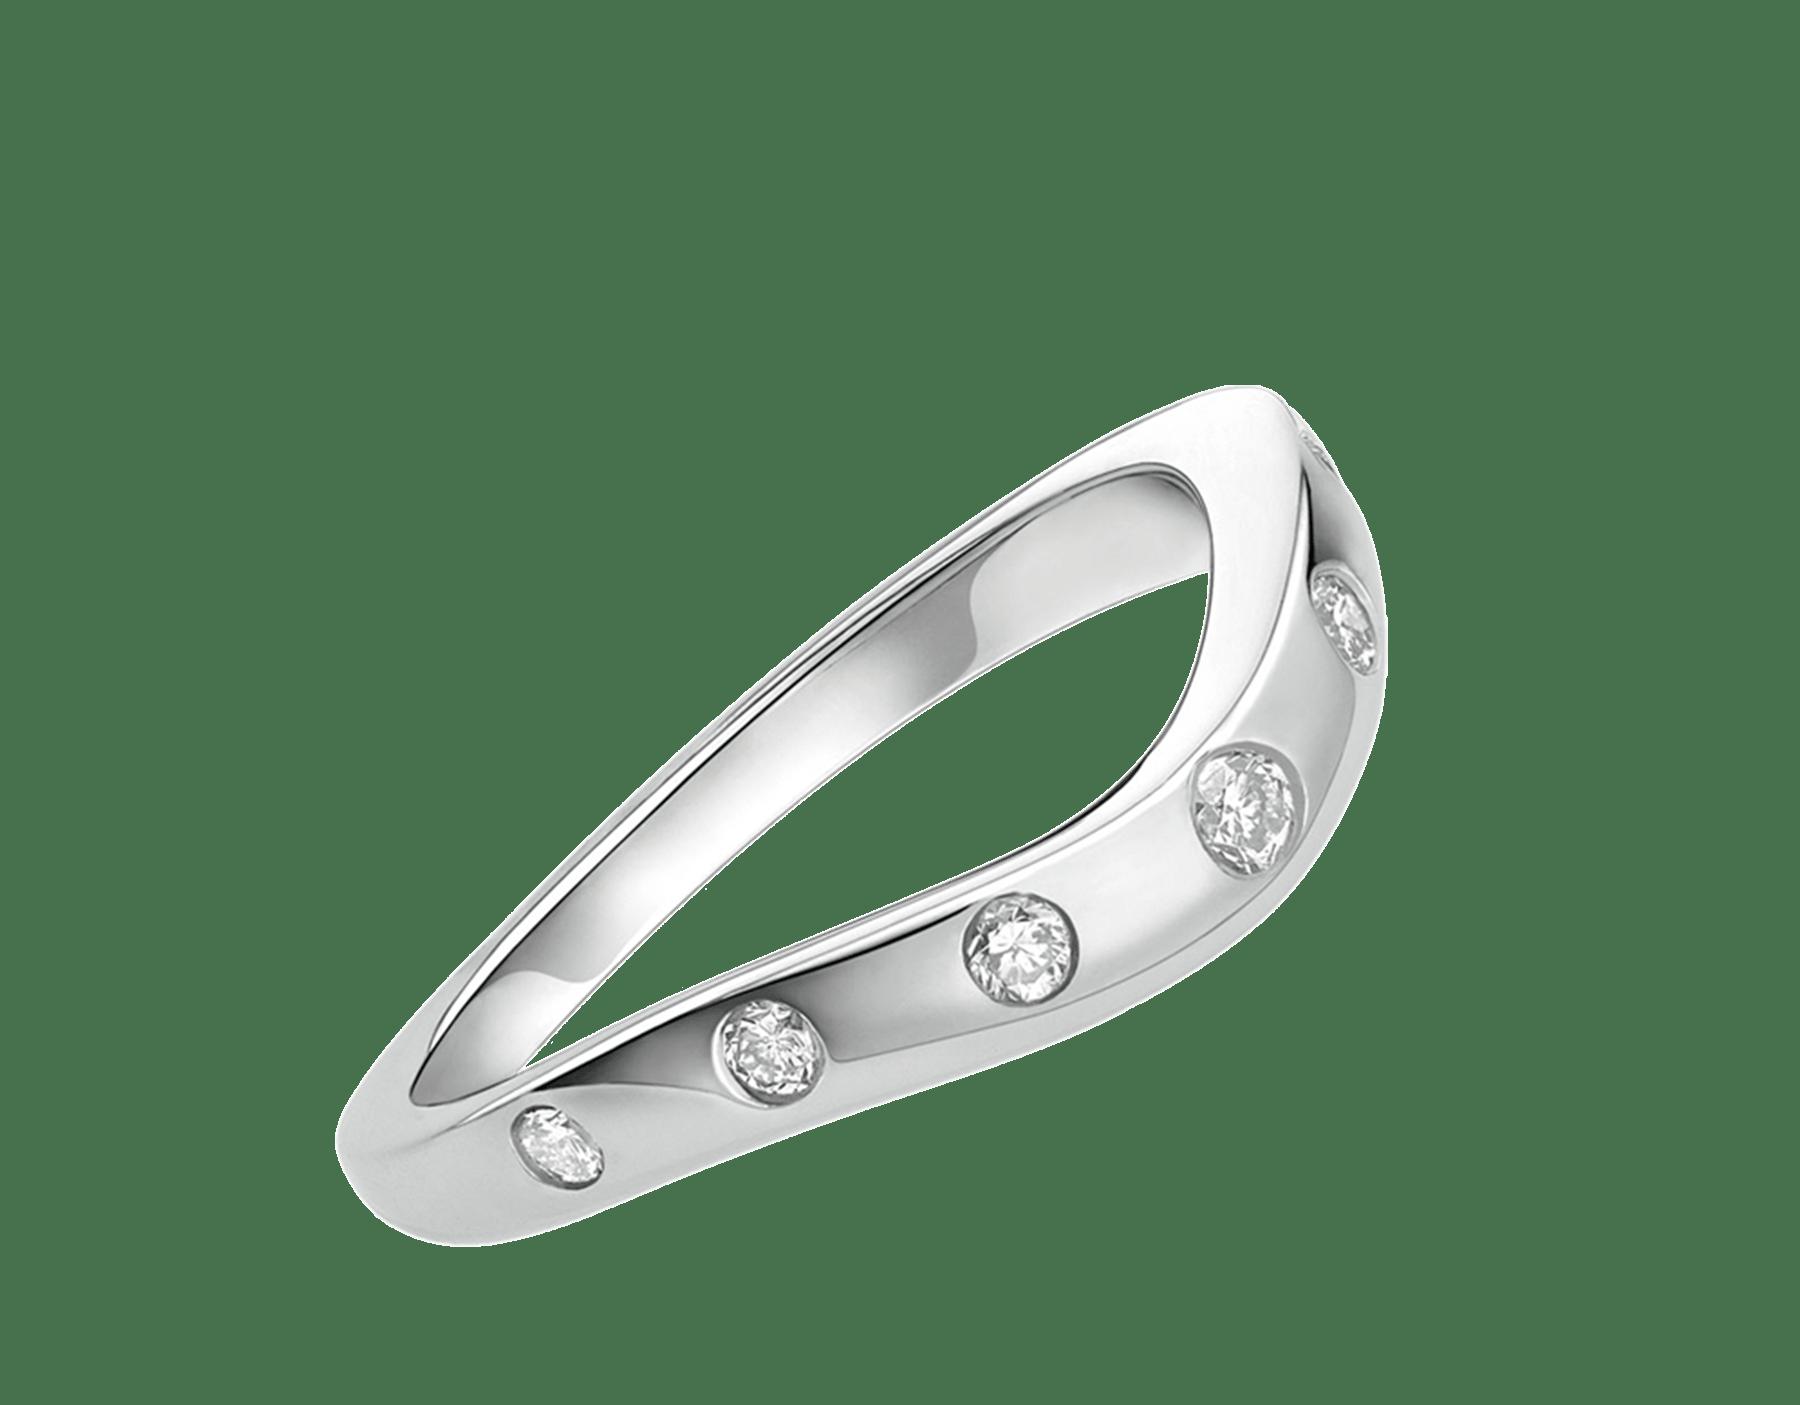 Corona platinum wedding ring with 7 diamonds with matching Corona 0.40 - 1.50 ct engagement rings AN856078 image 1